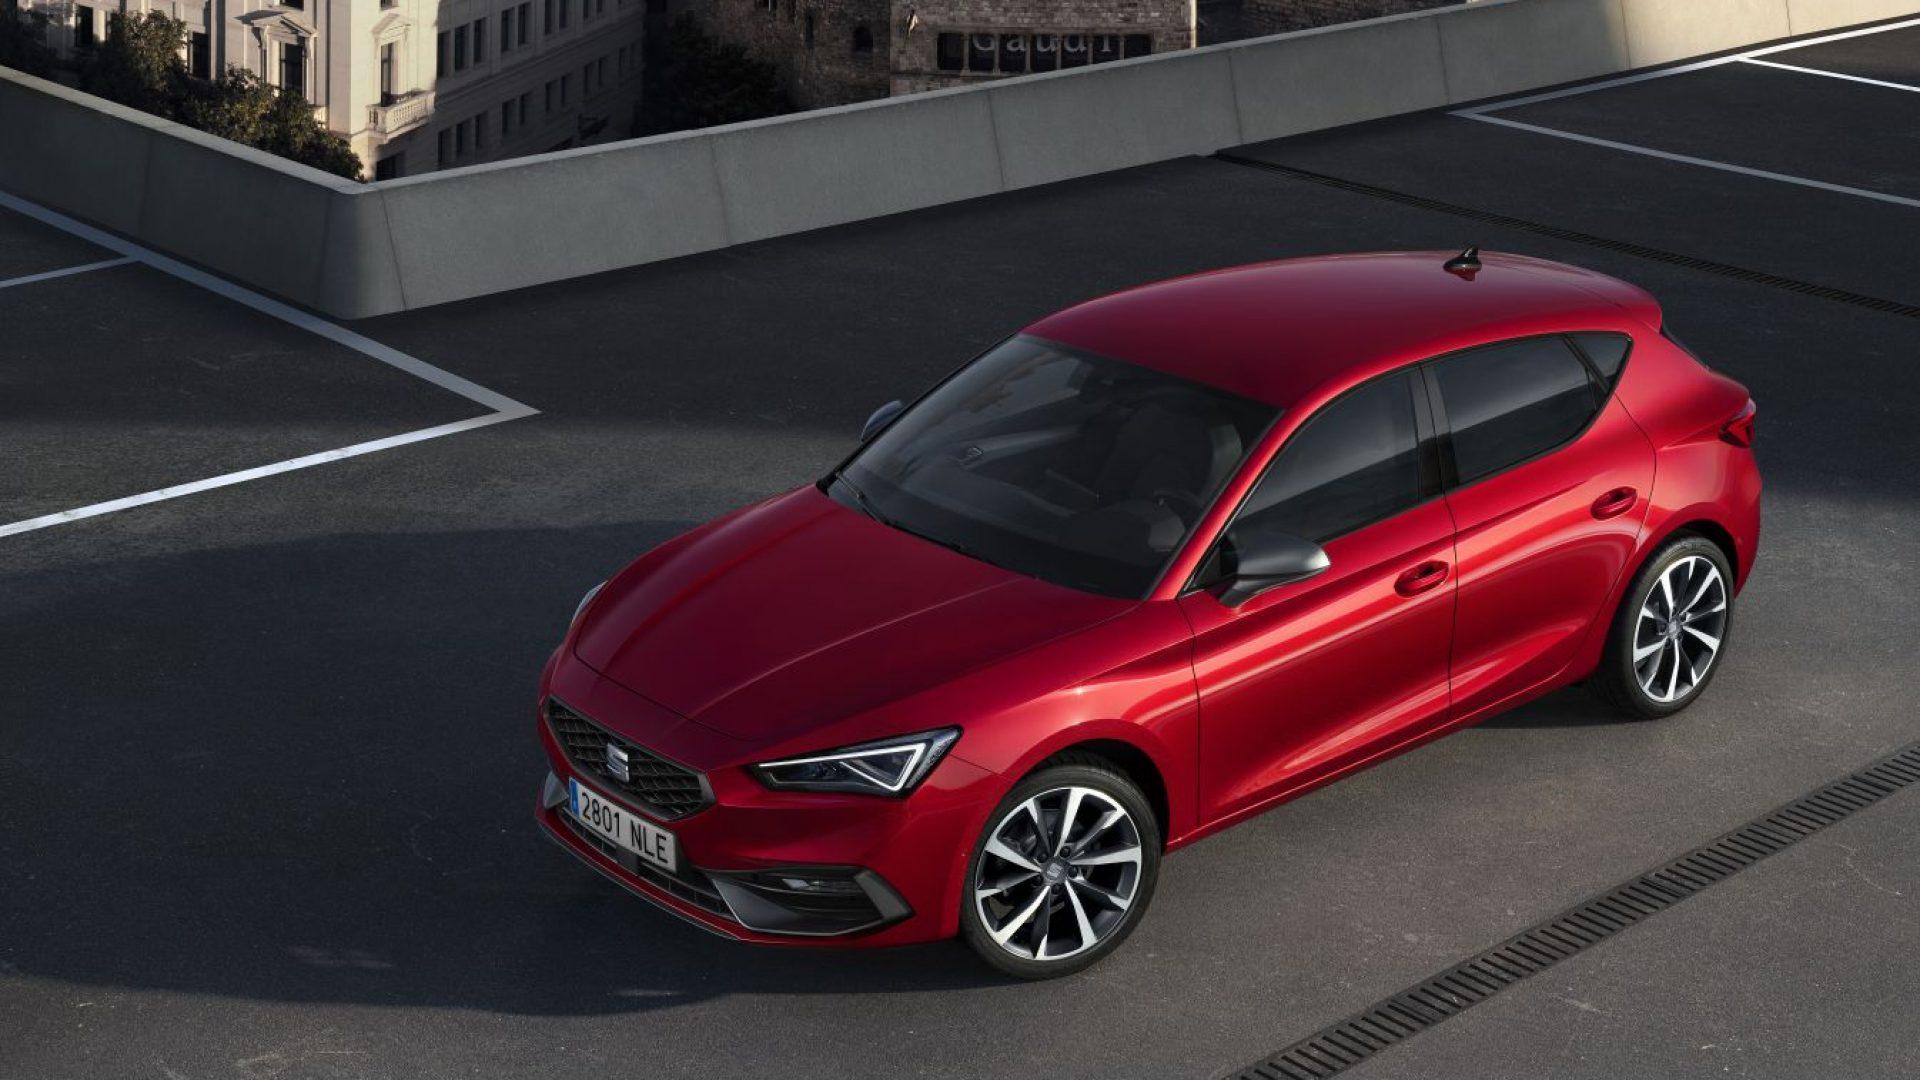 All-new-SEAT-Leon-5-doors_02_HQ